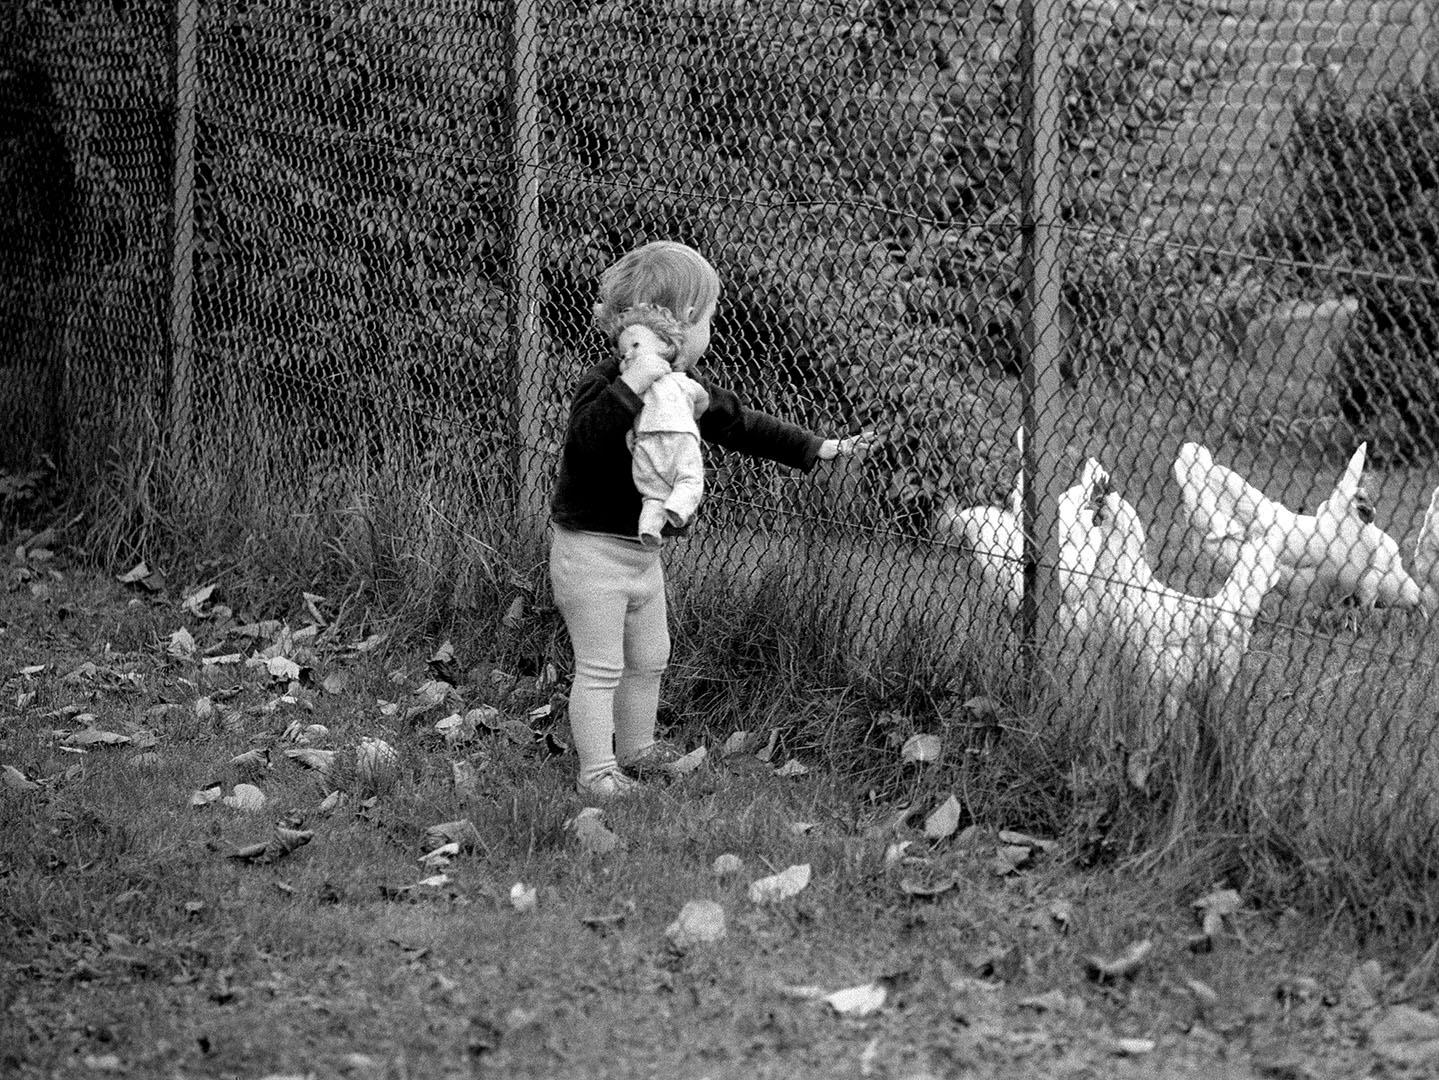 Children_009_P4.34